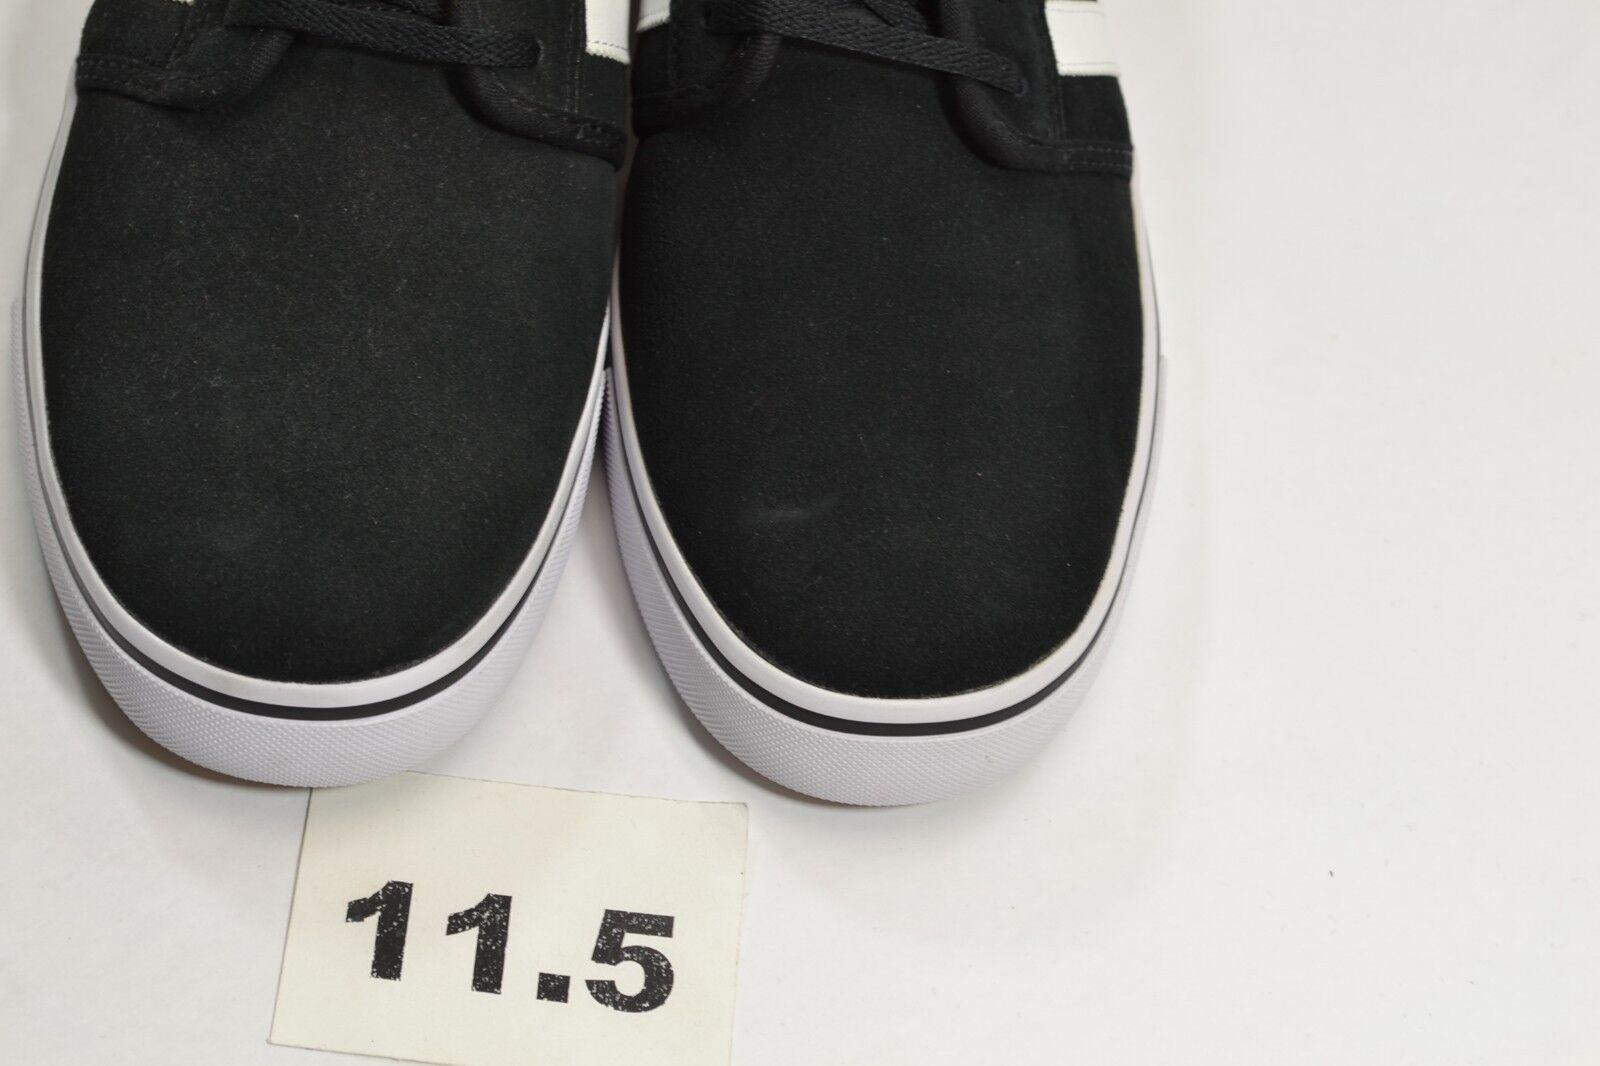 Schwarz - weiß (discounted - schwarz (discounted weiß adidas seeley (223) männer - schuhe 554dcf